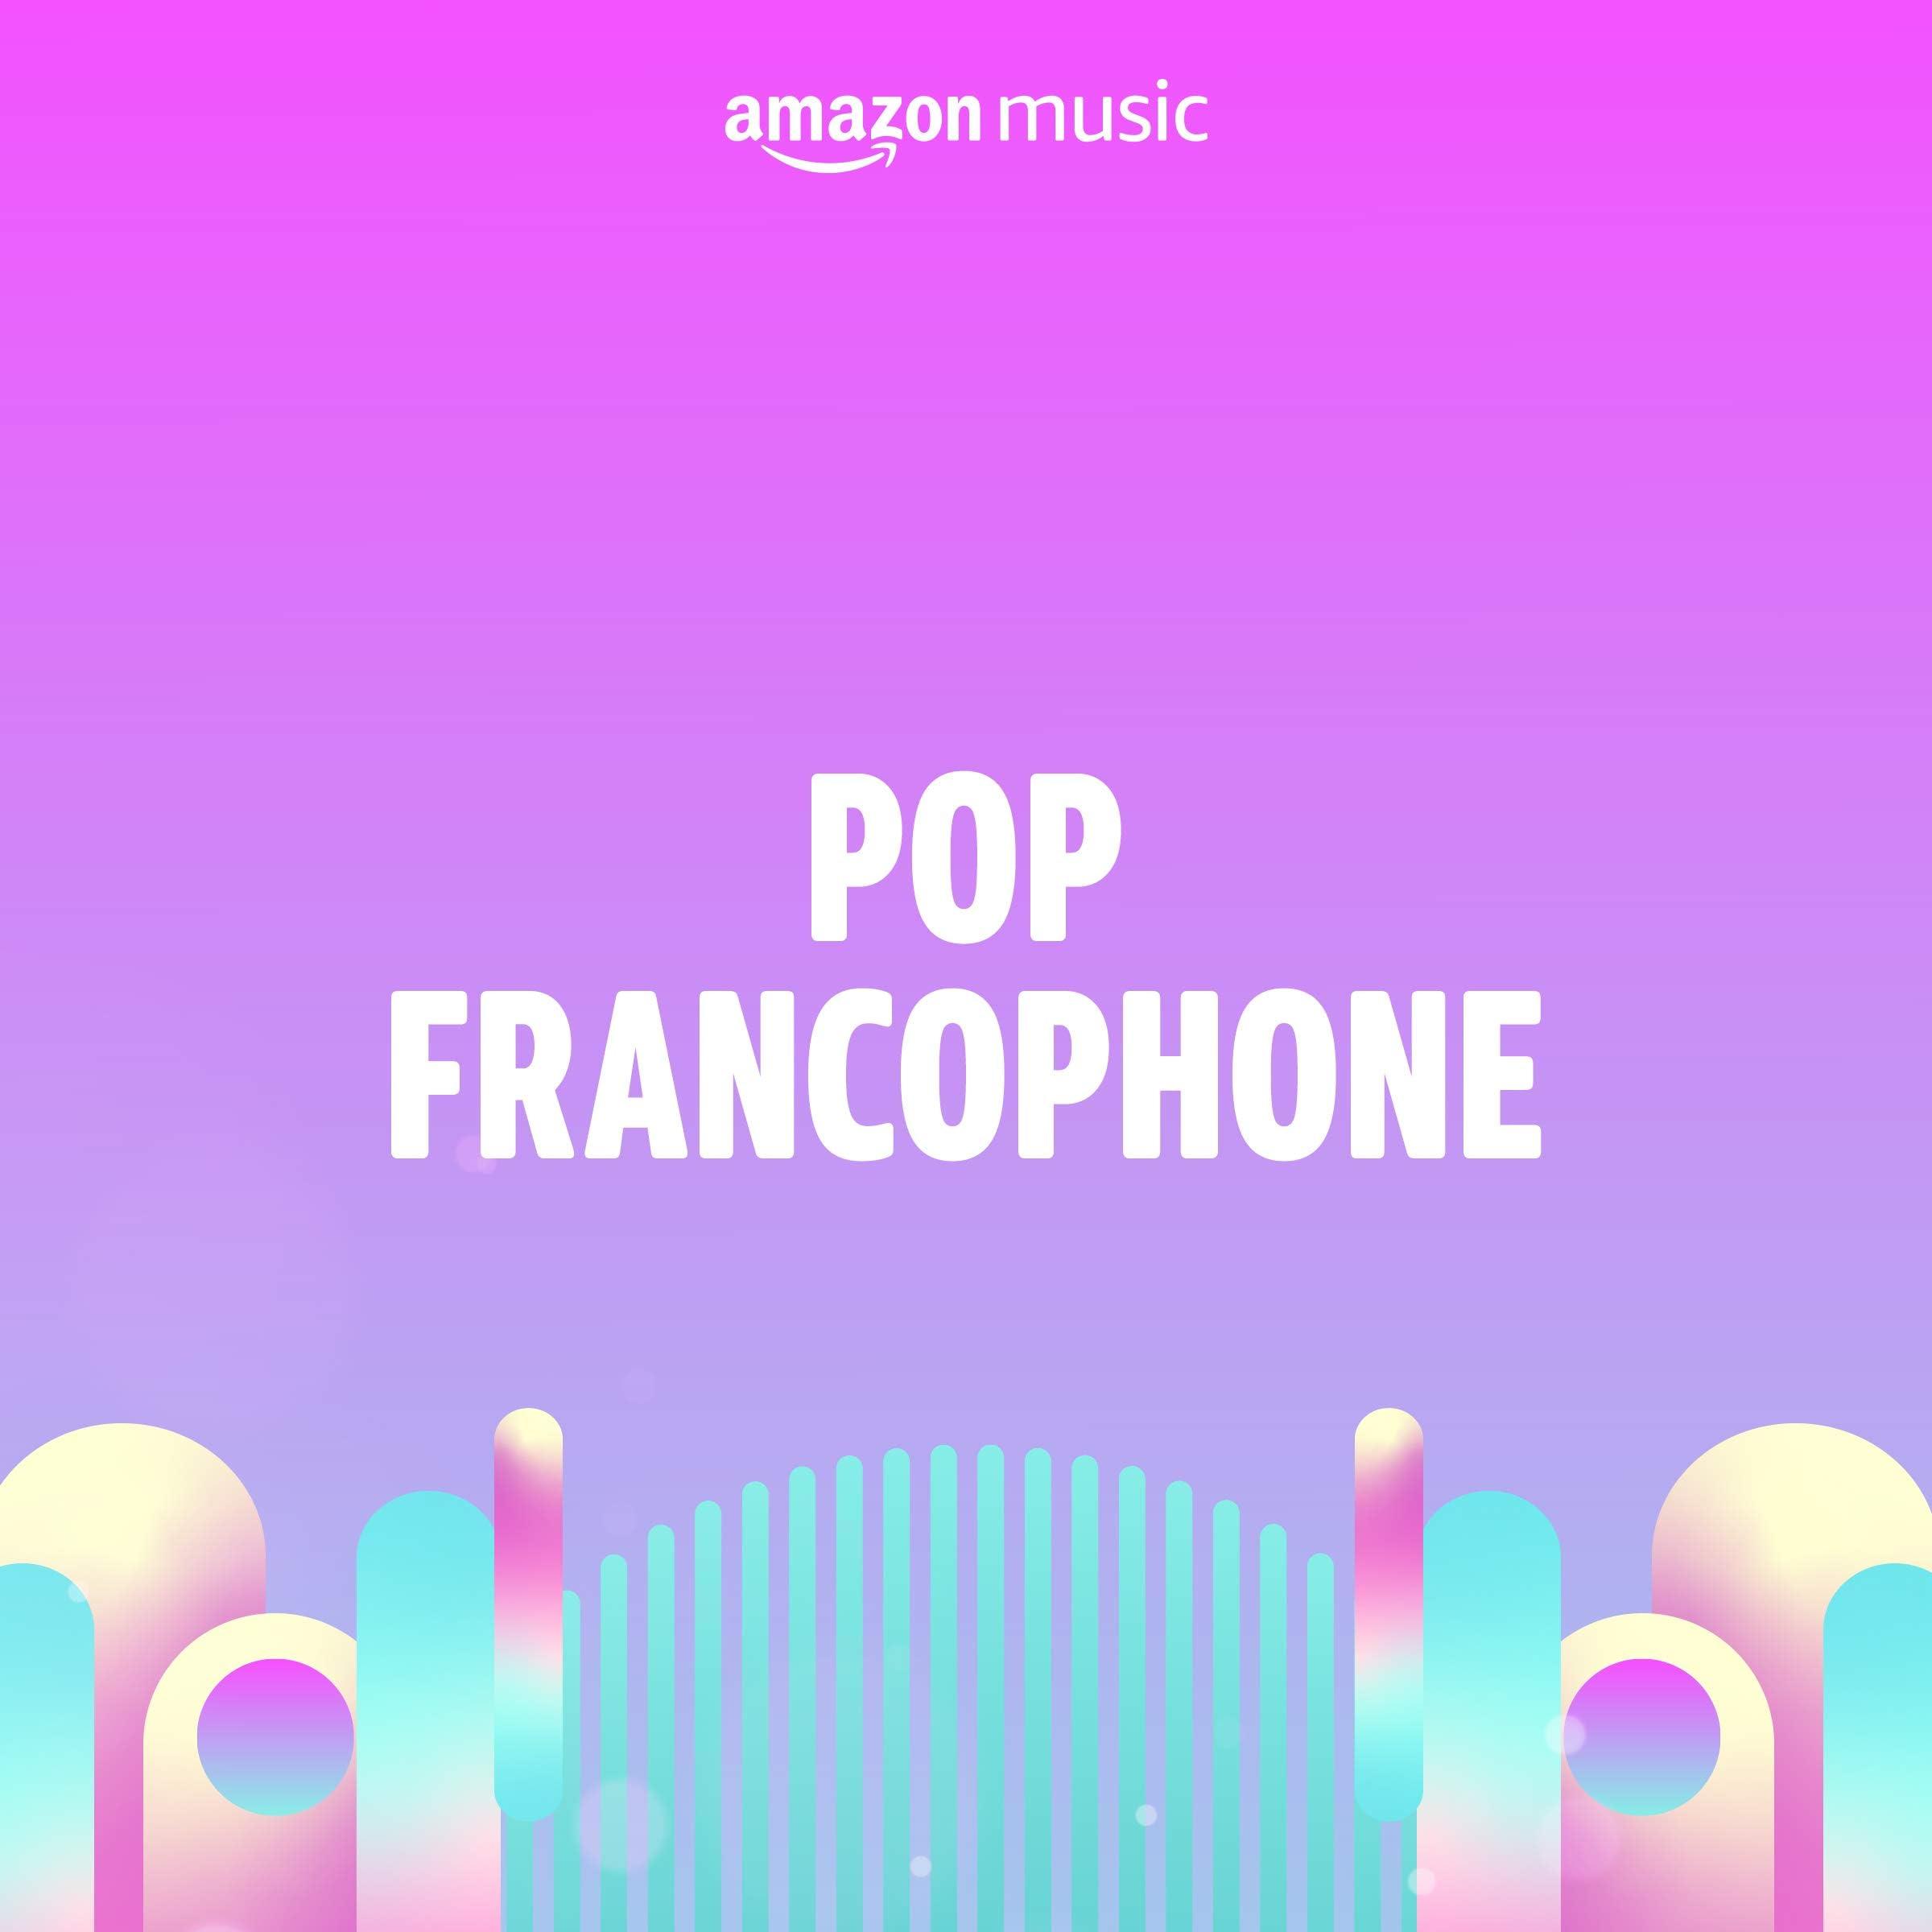 Pop Francophone